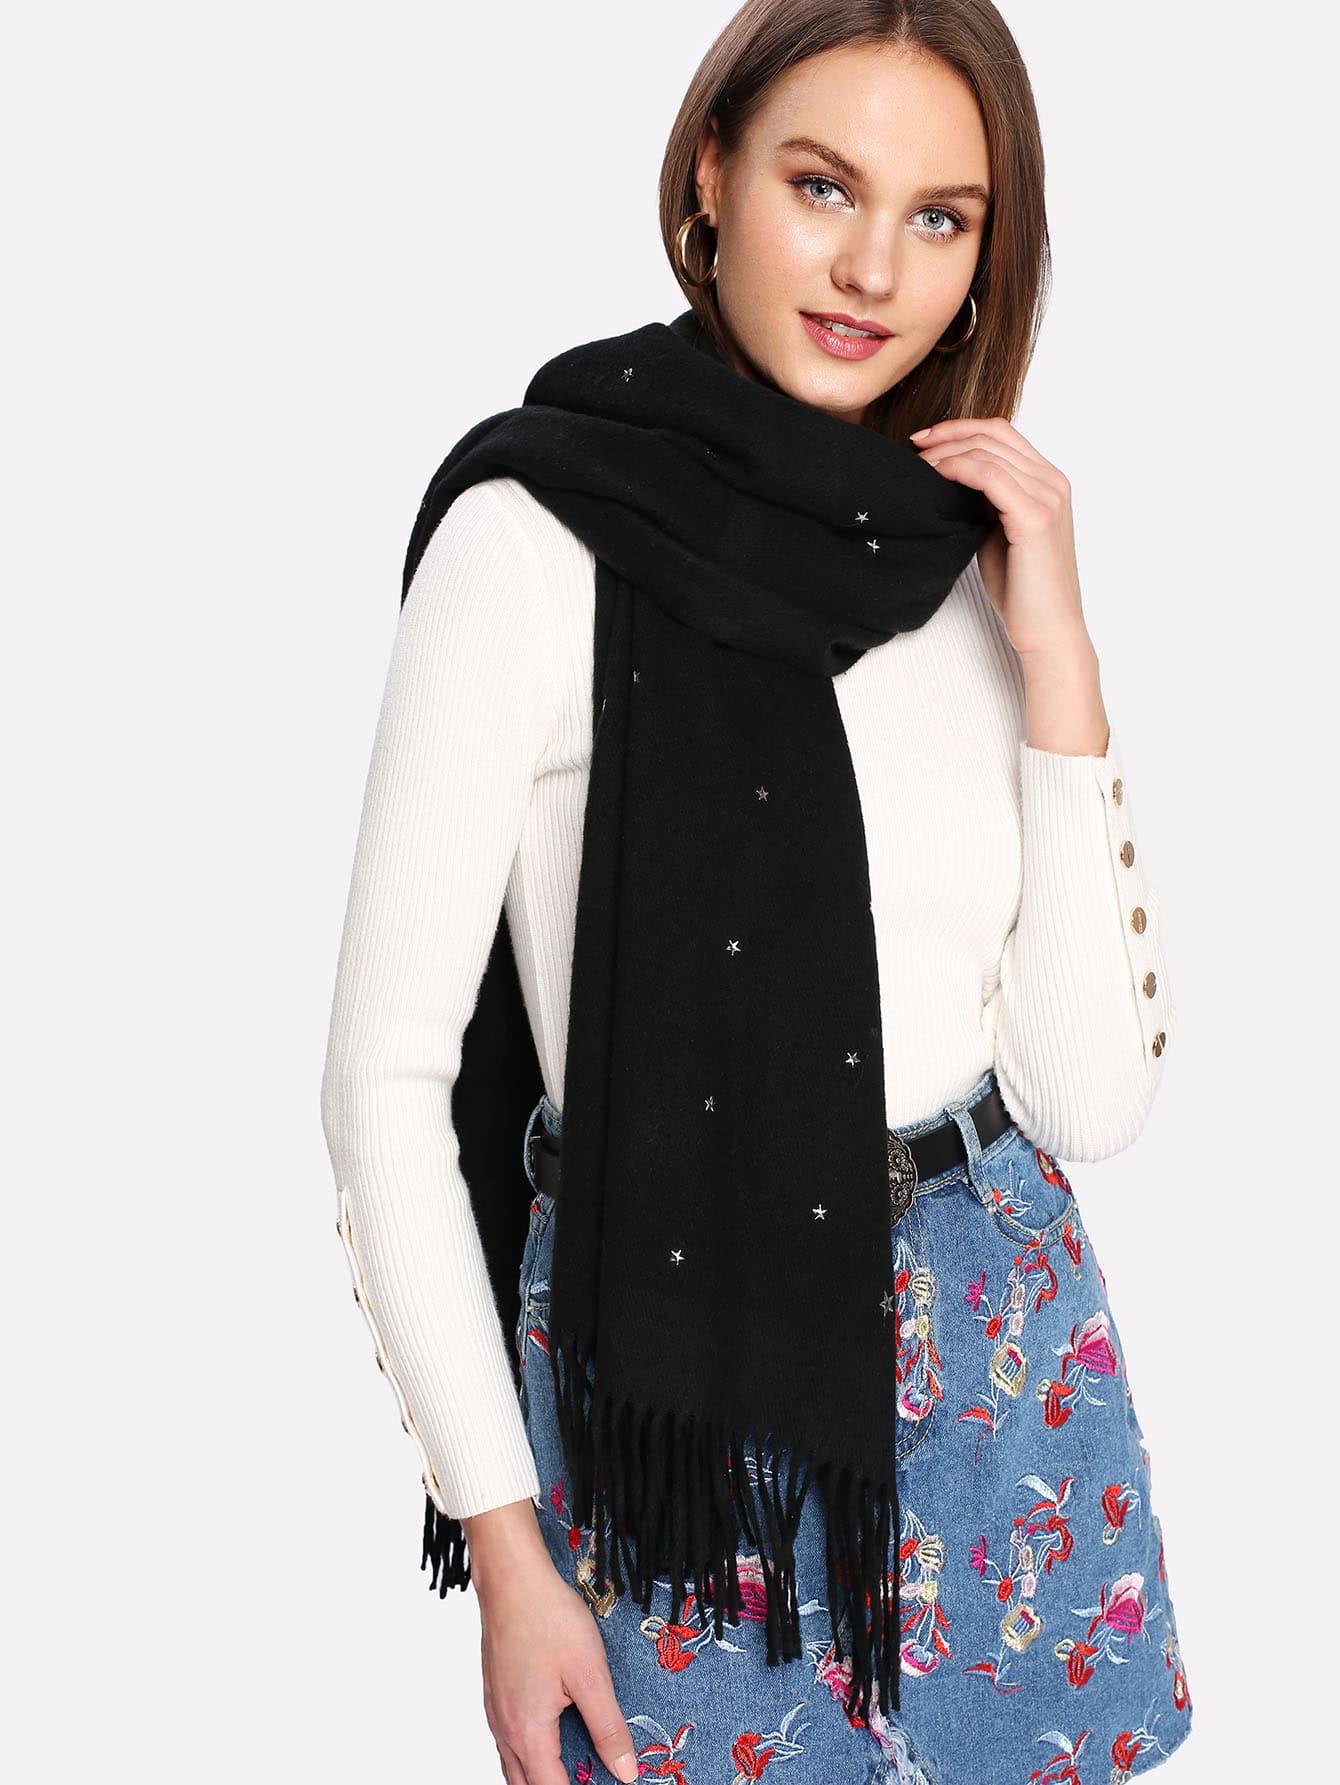 Fringe Trim Star Decorated Scarf mini star print fringe tassel scarf